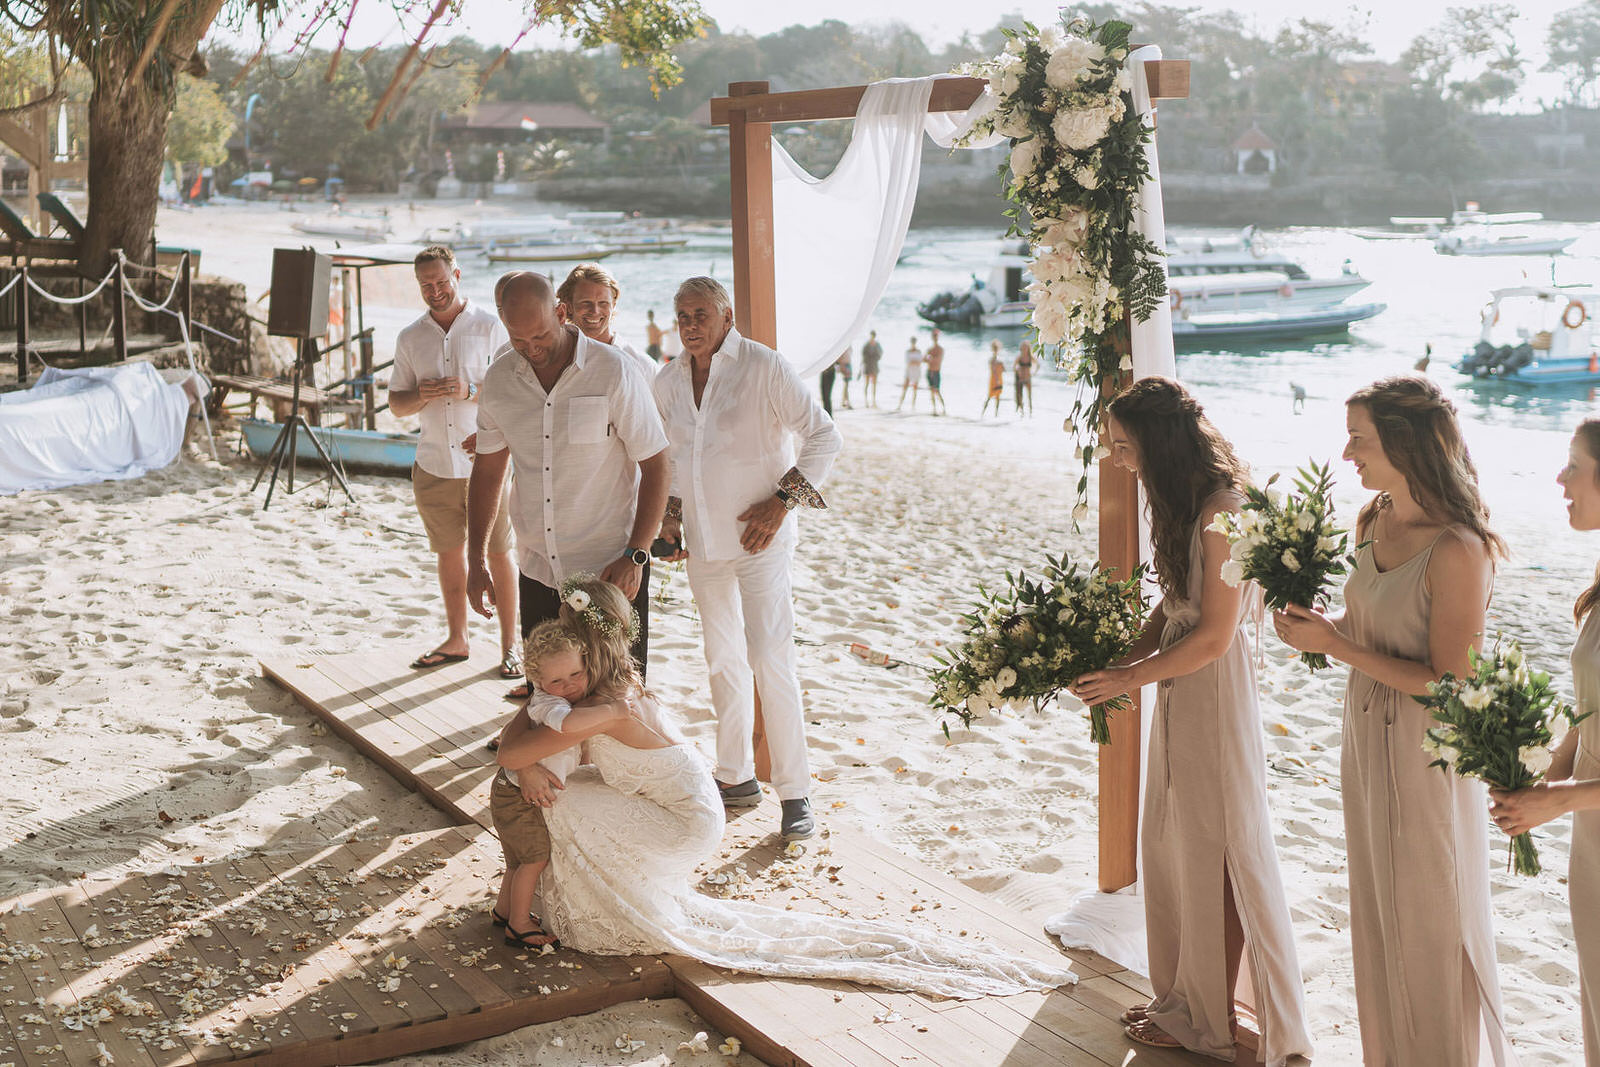 newfound-hai-tide-nusa-lembongan-bali-wedding-photographers-116